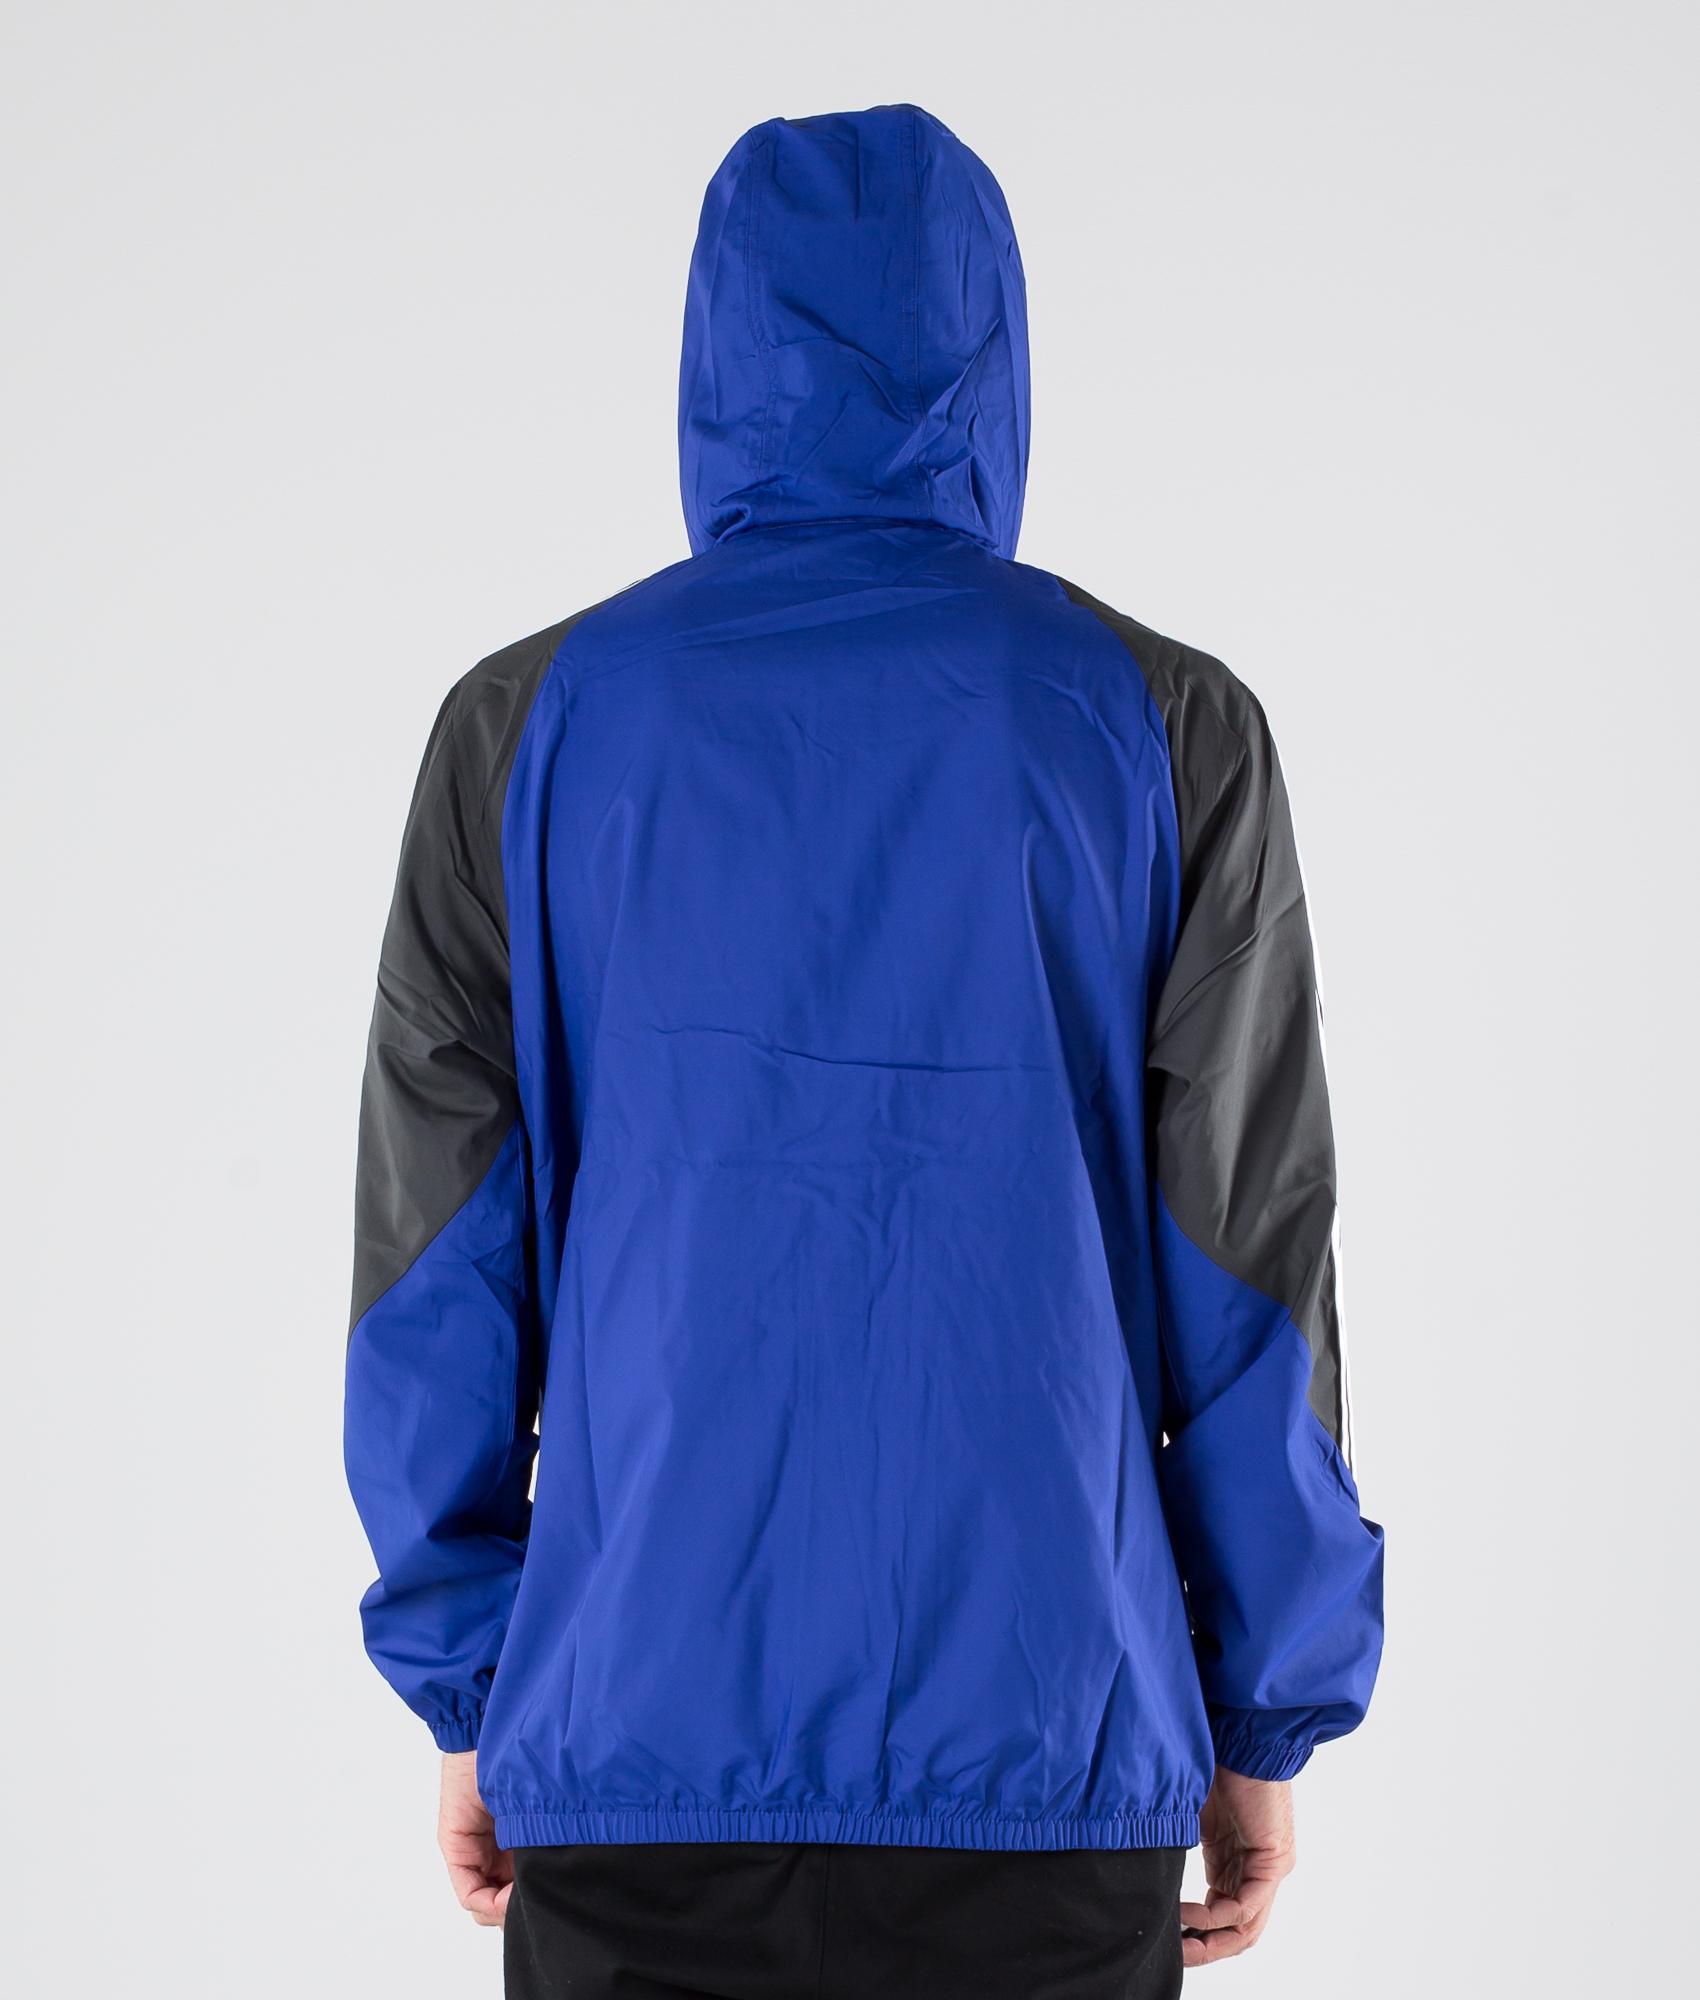 Active GreyWhite BlueDgh Solid Skateboarding Adidas Chaqueta Insley WYE9IeD2H